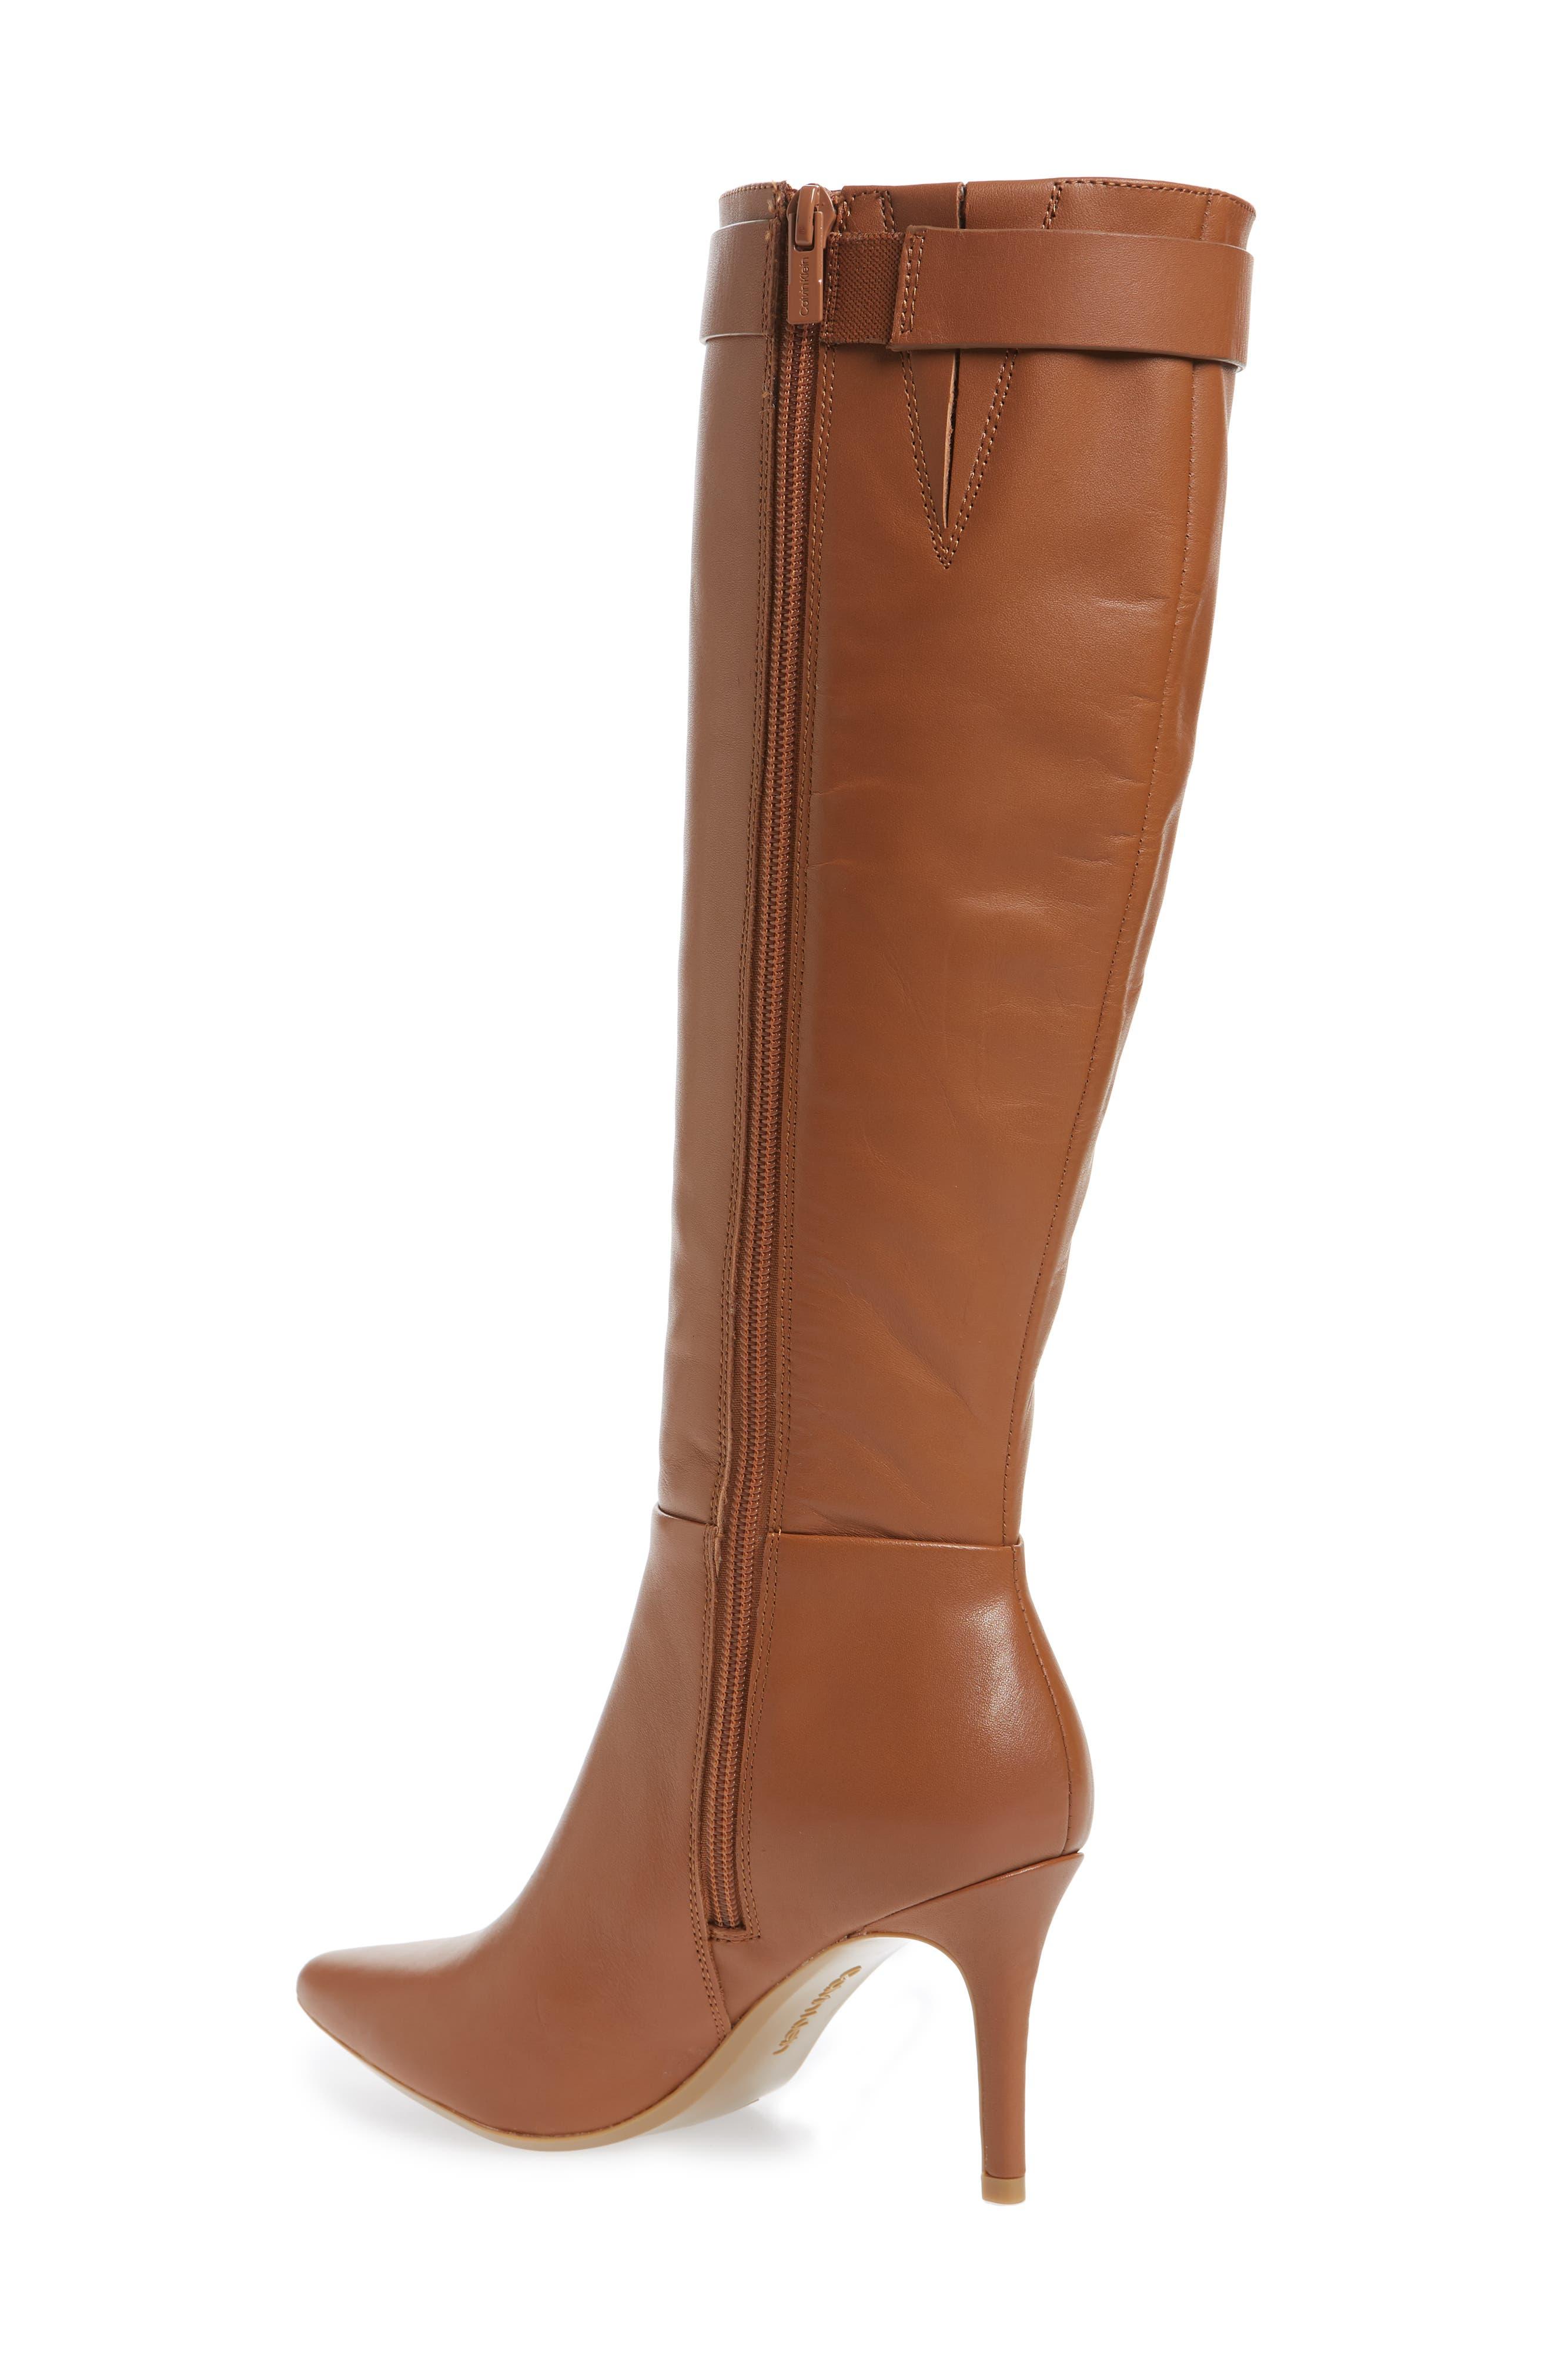 Glydia Stiletto Knee High Boot,                             Alternate thumbnail 2, color,                             COGNAC LEATHER